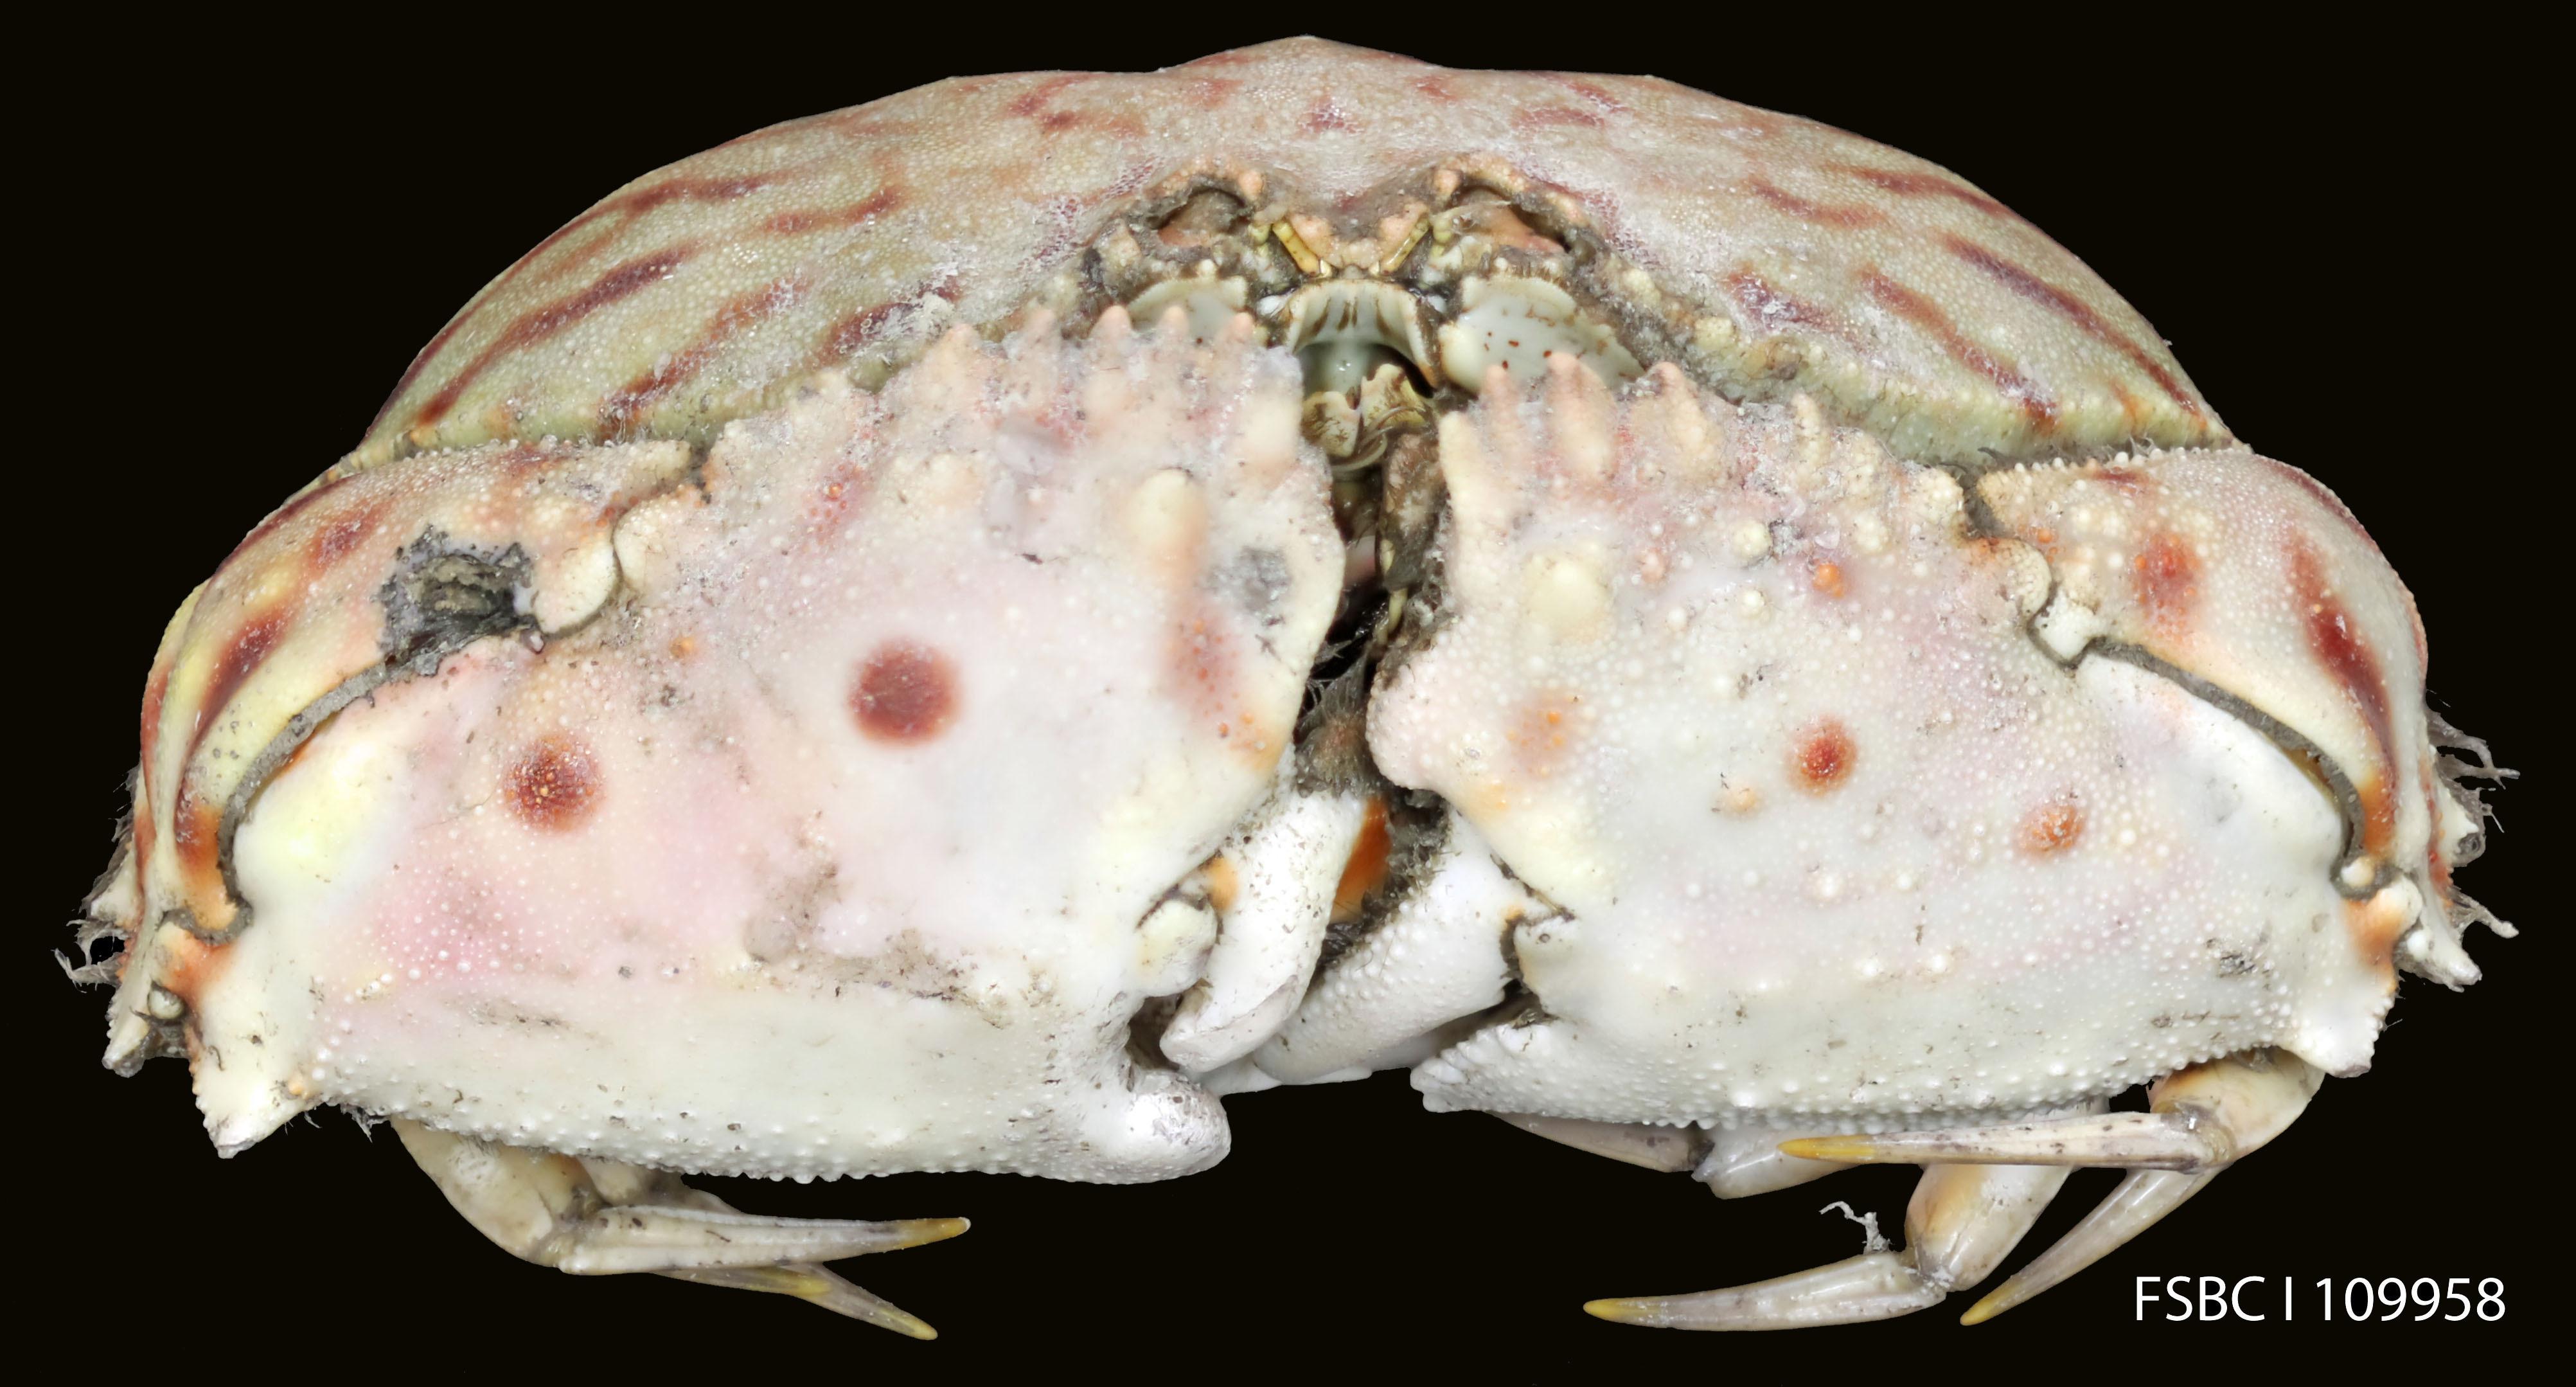 Image of flame box crab